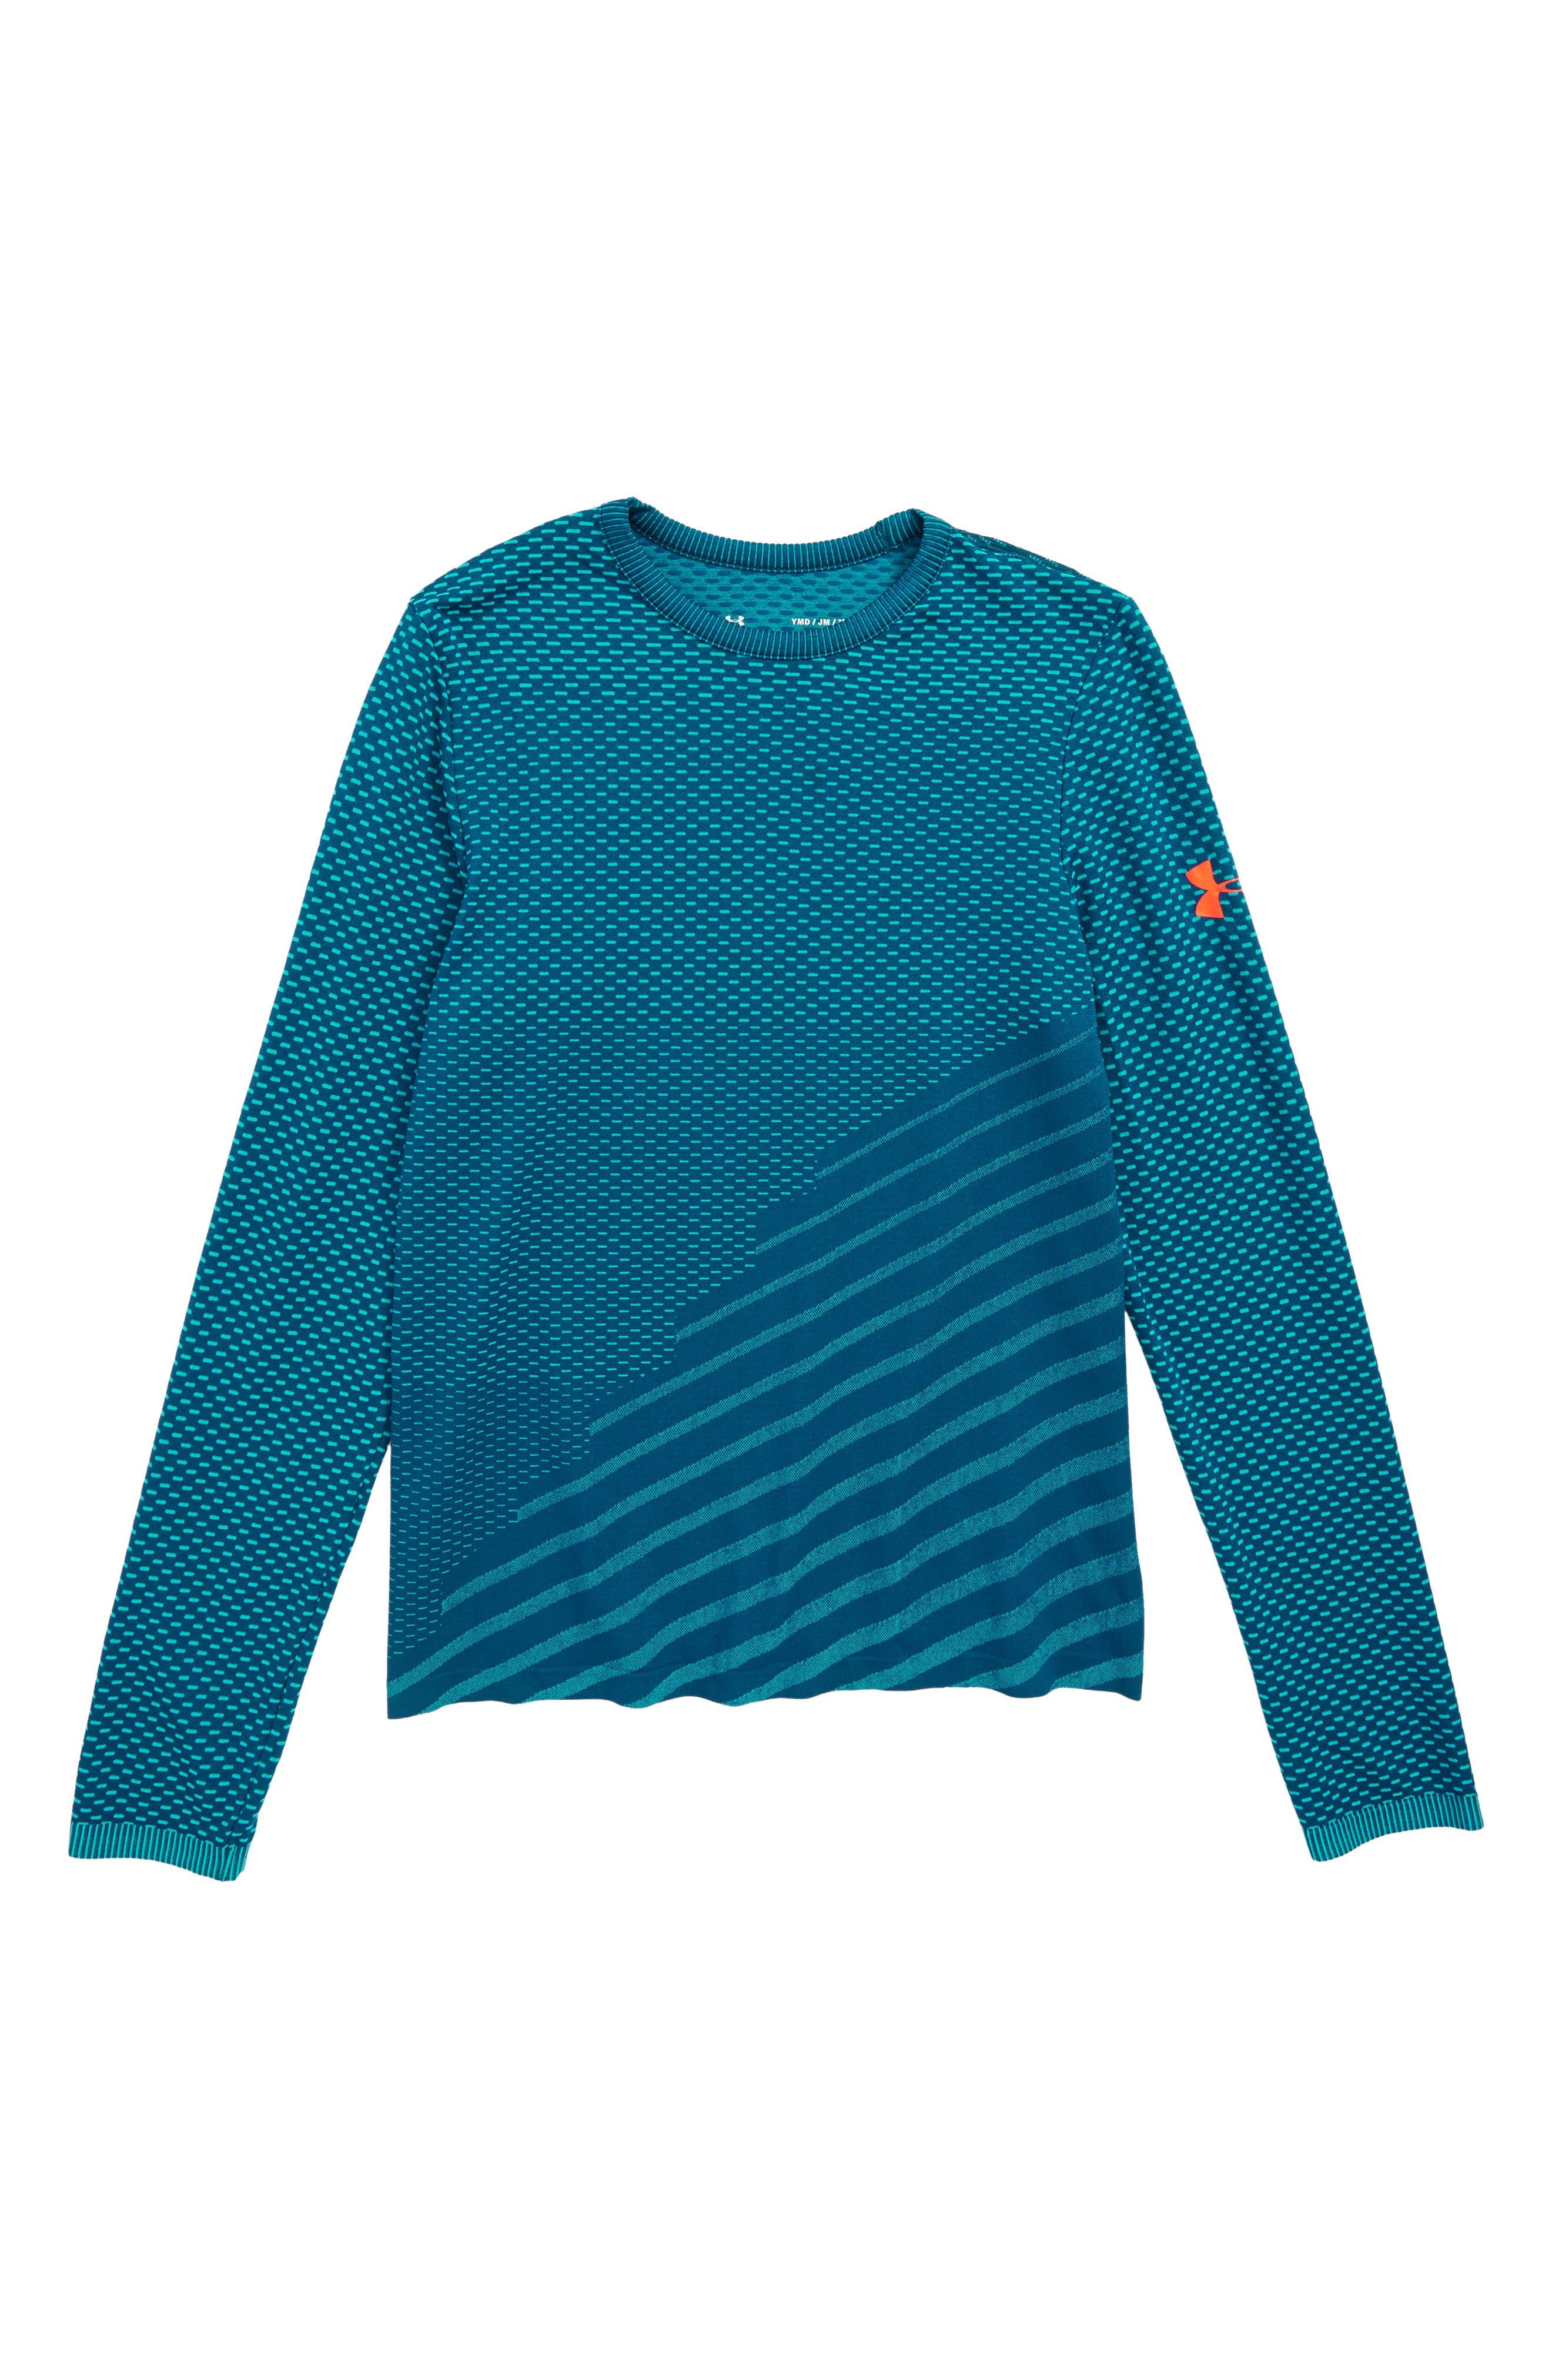 Seamless HeatGear<sup>®</sup> Shirt,                         Main,                         color, TECHNO TEAL